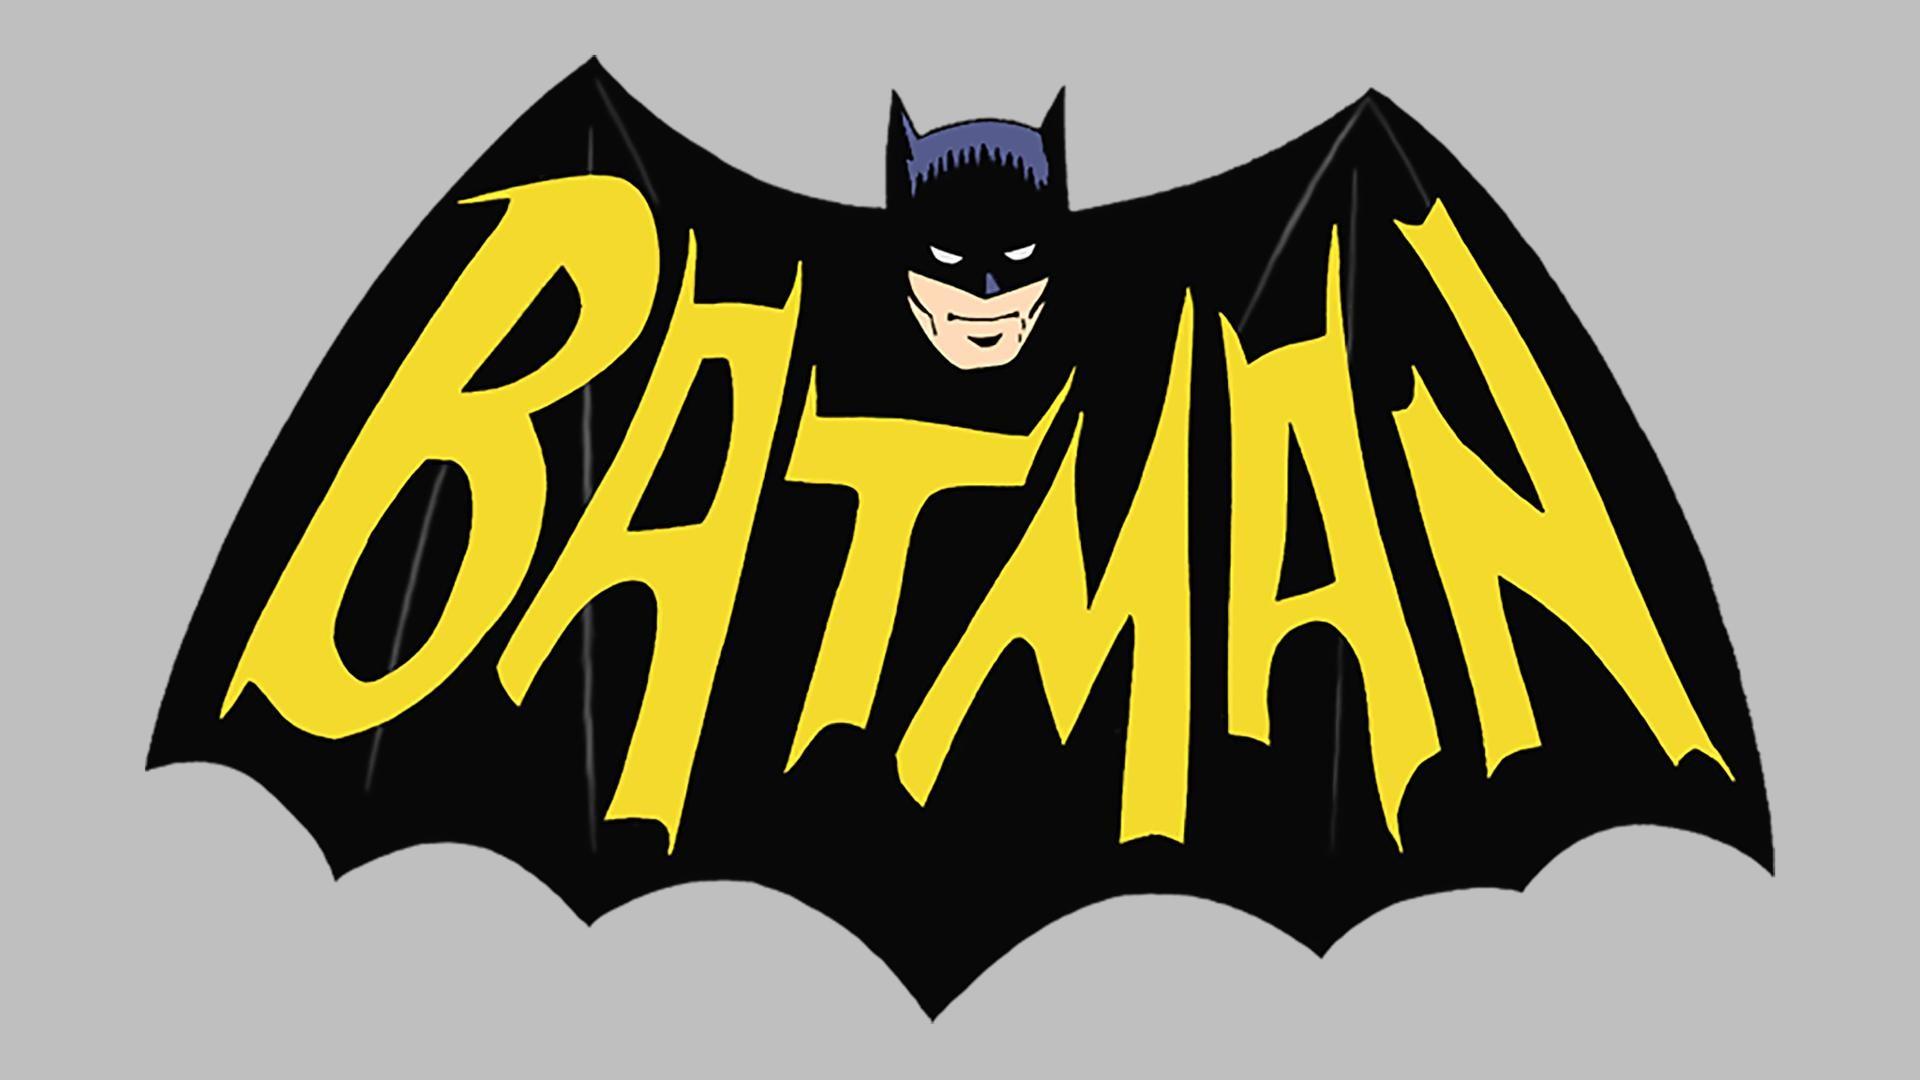 Superman Logo Hd Iphone Wallpaper Batman Tv Series Wallpaper 66 Images